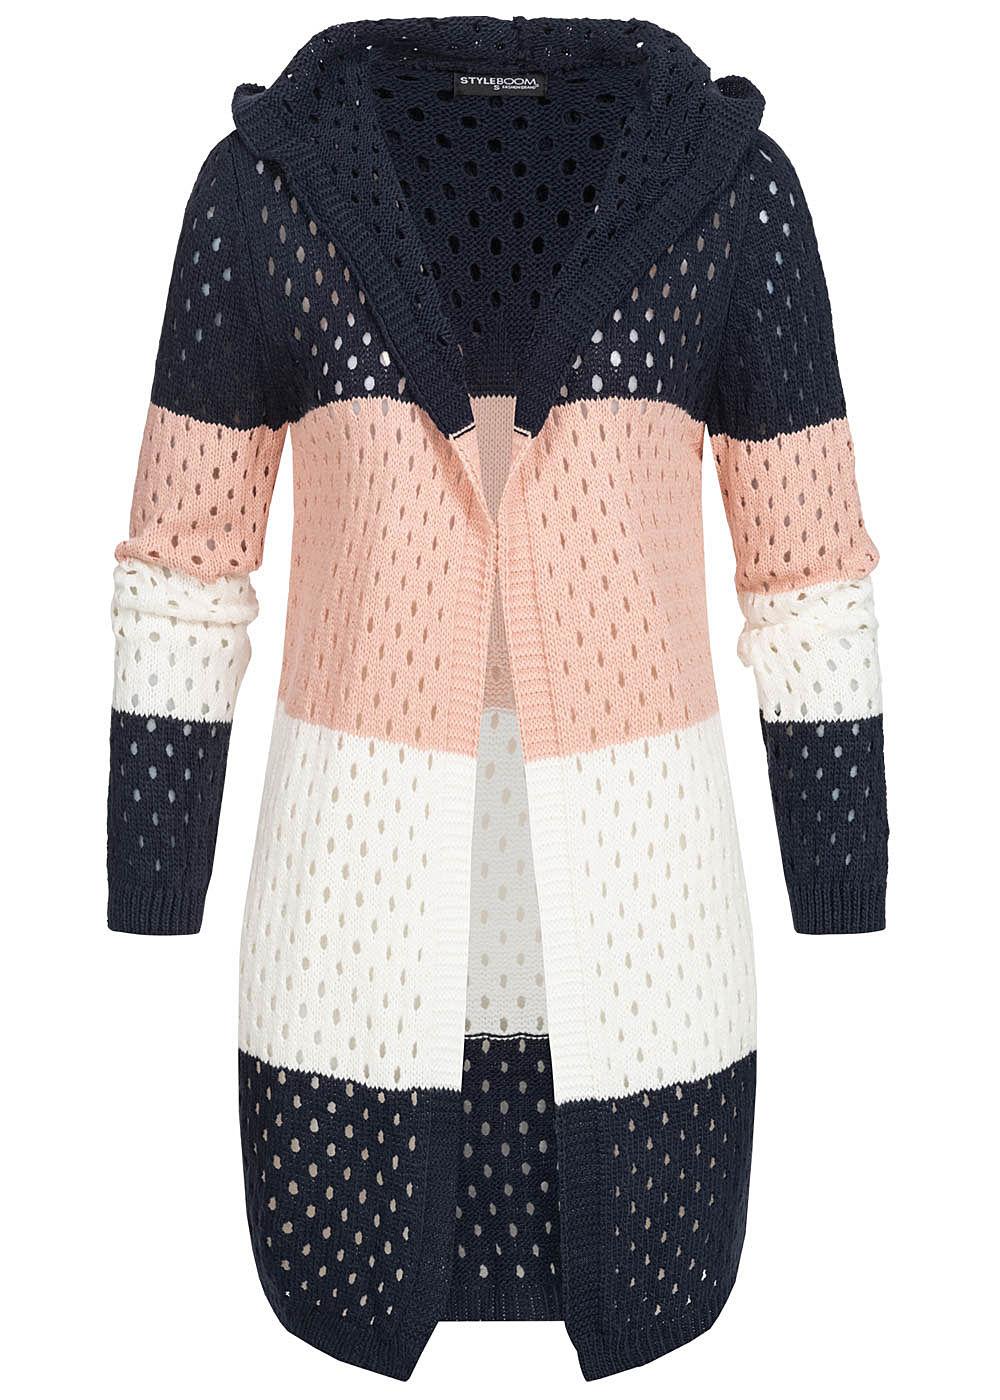 Styleboom Fashion Damen Colorblock Strick Cardigan Kapuze